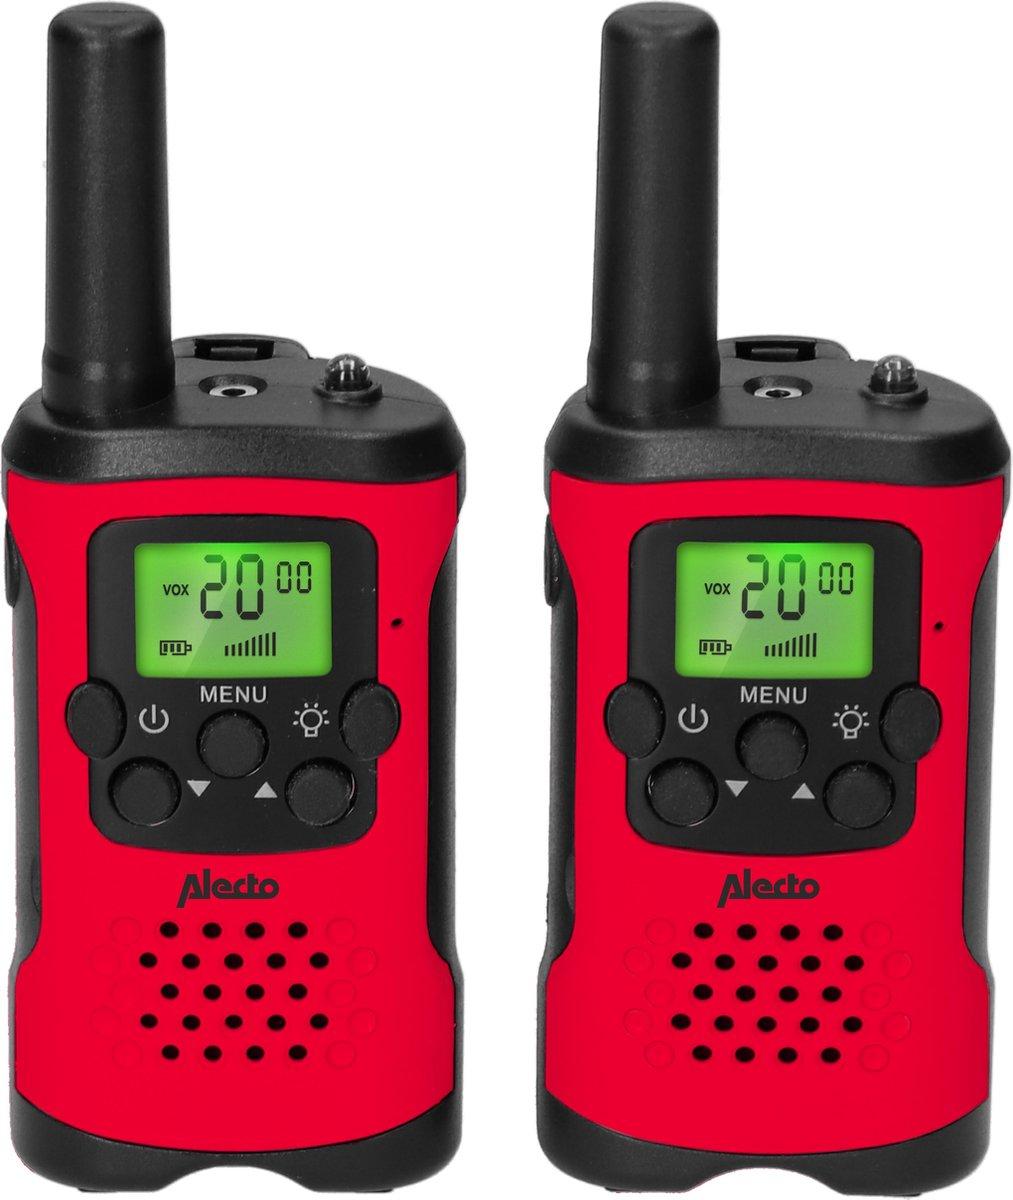 Alecto FR115RD - Set van twee walkie talkies voor kinderen - tot 7 kilometer bereik, Rood